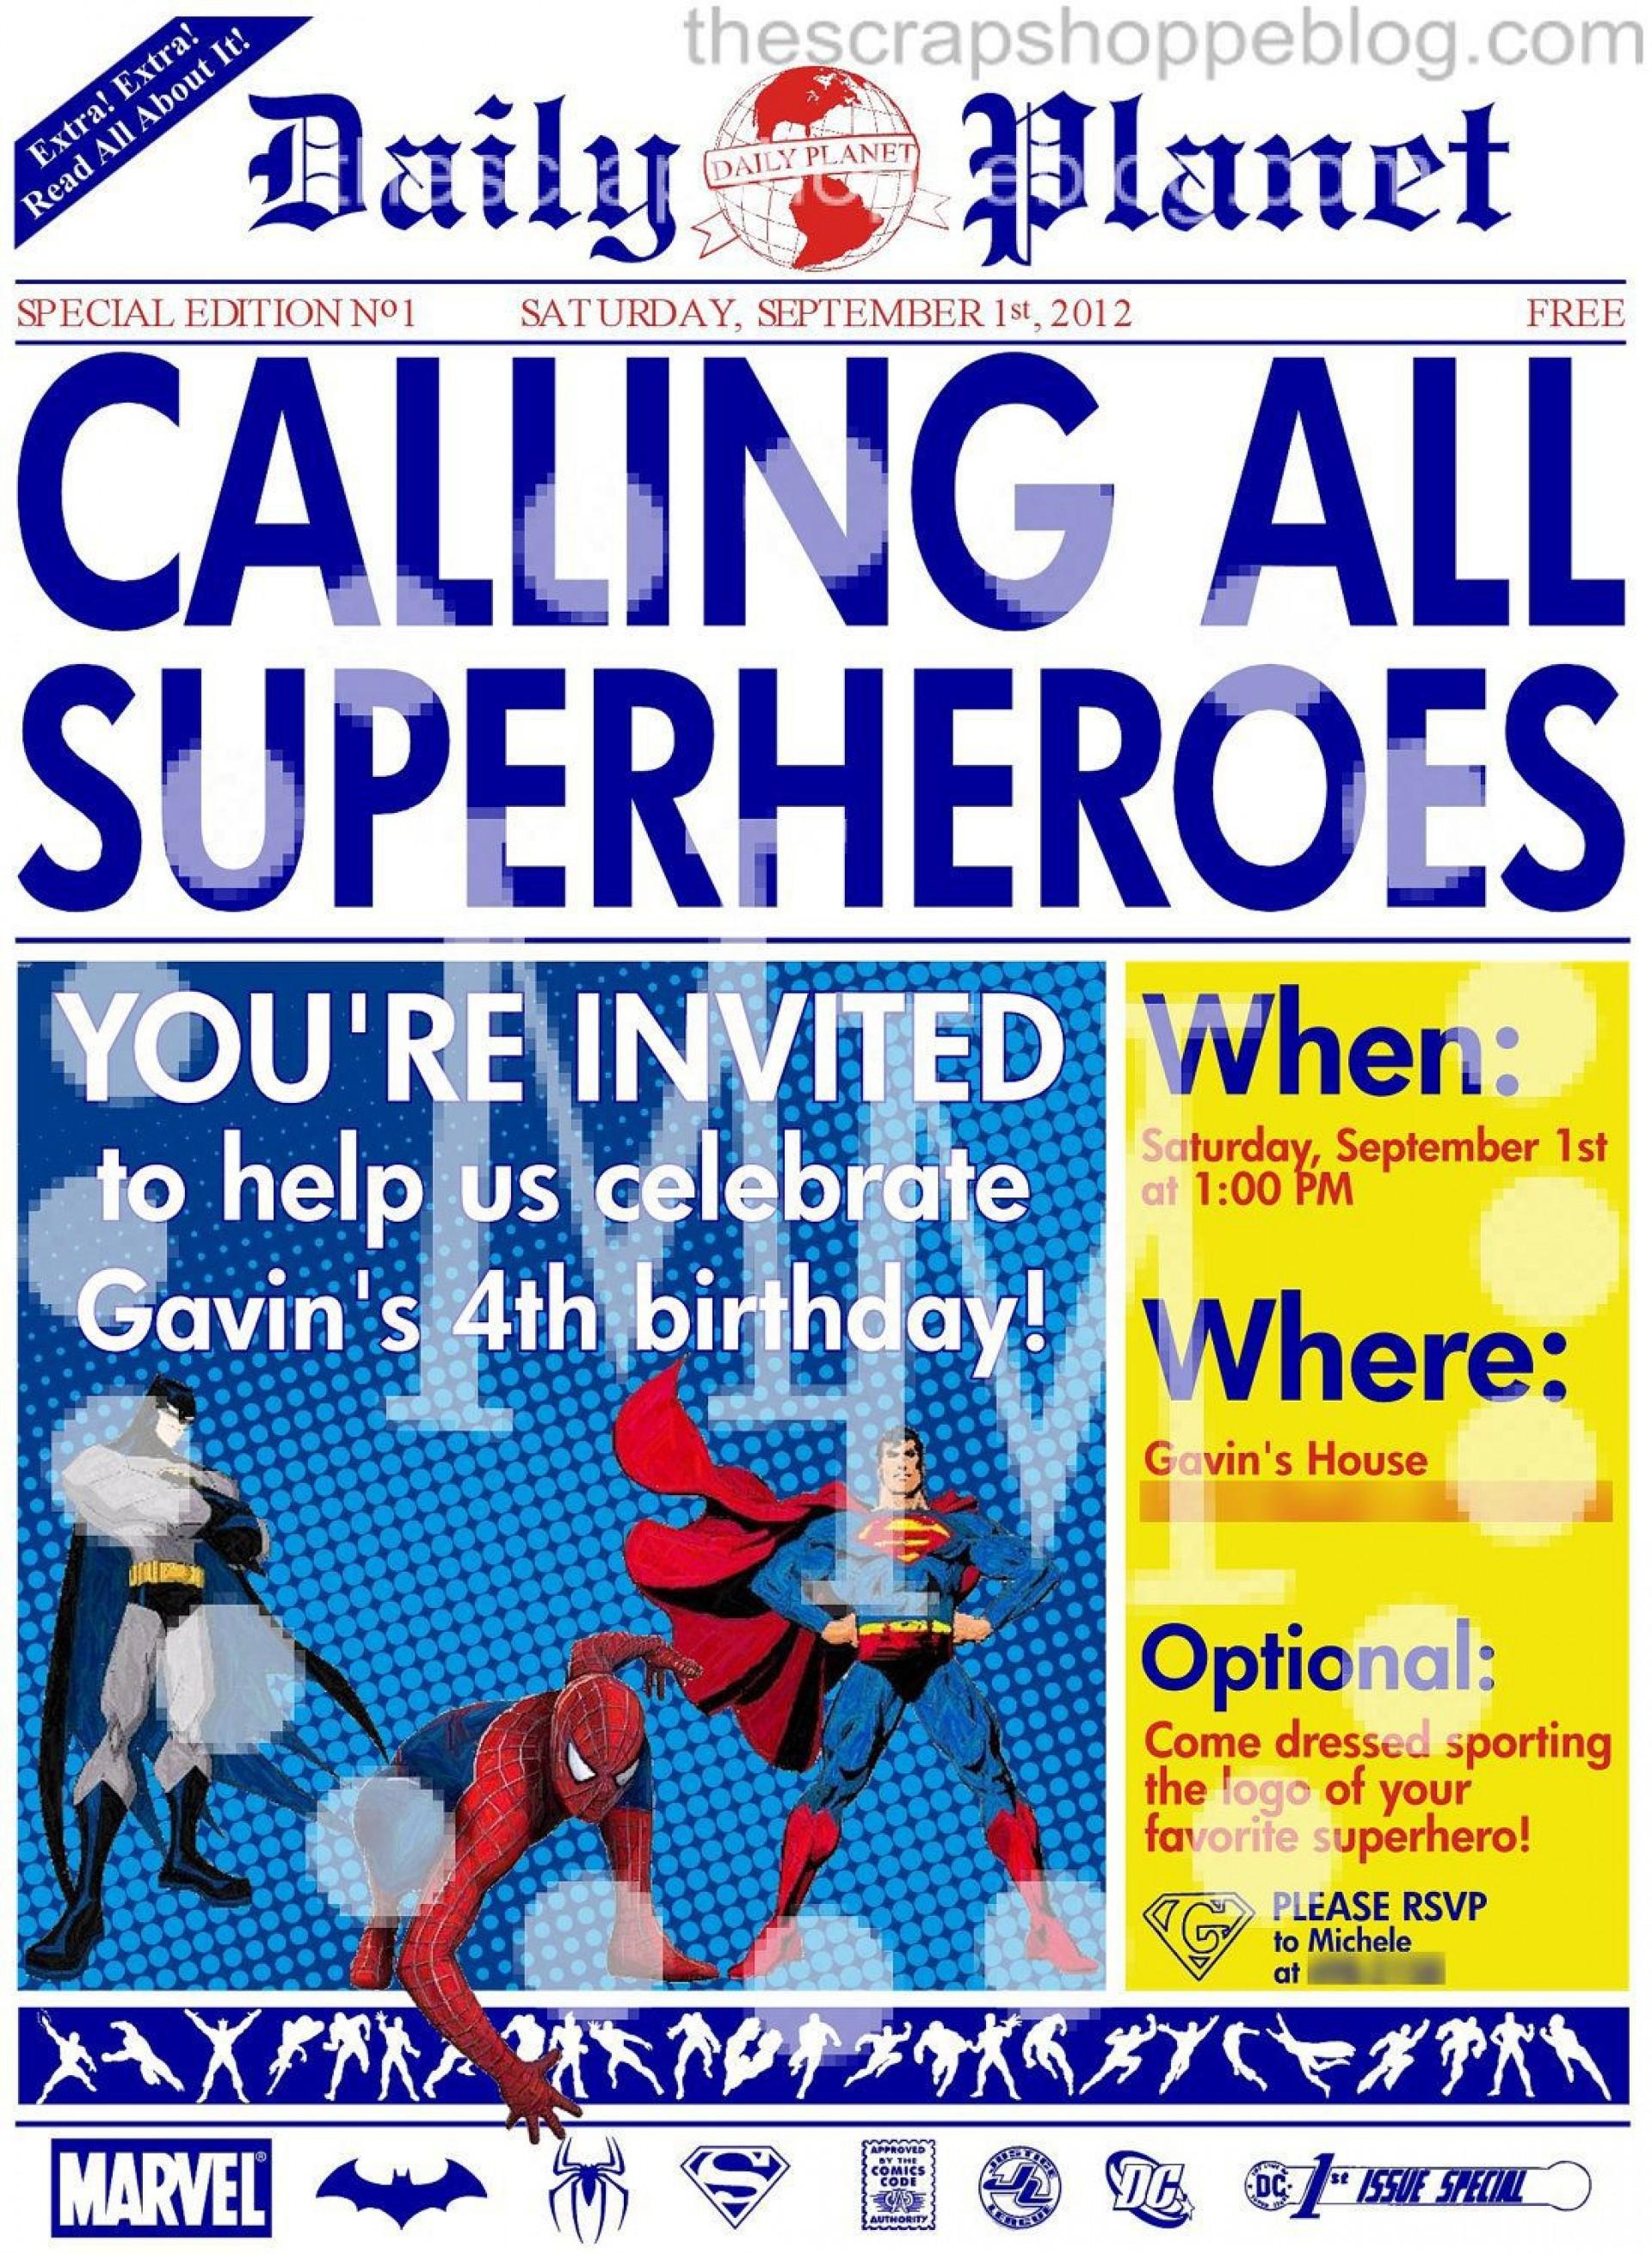 008 Shocking Superhero Newspaper Invitation Template Free Design 1920